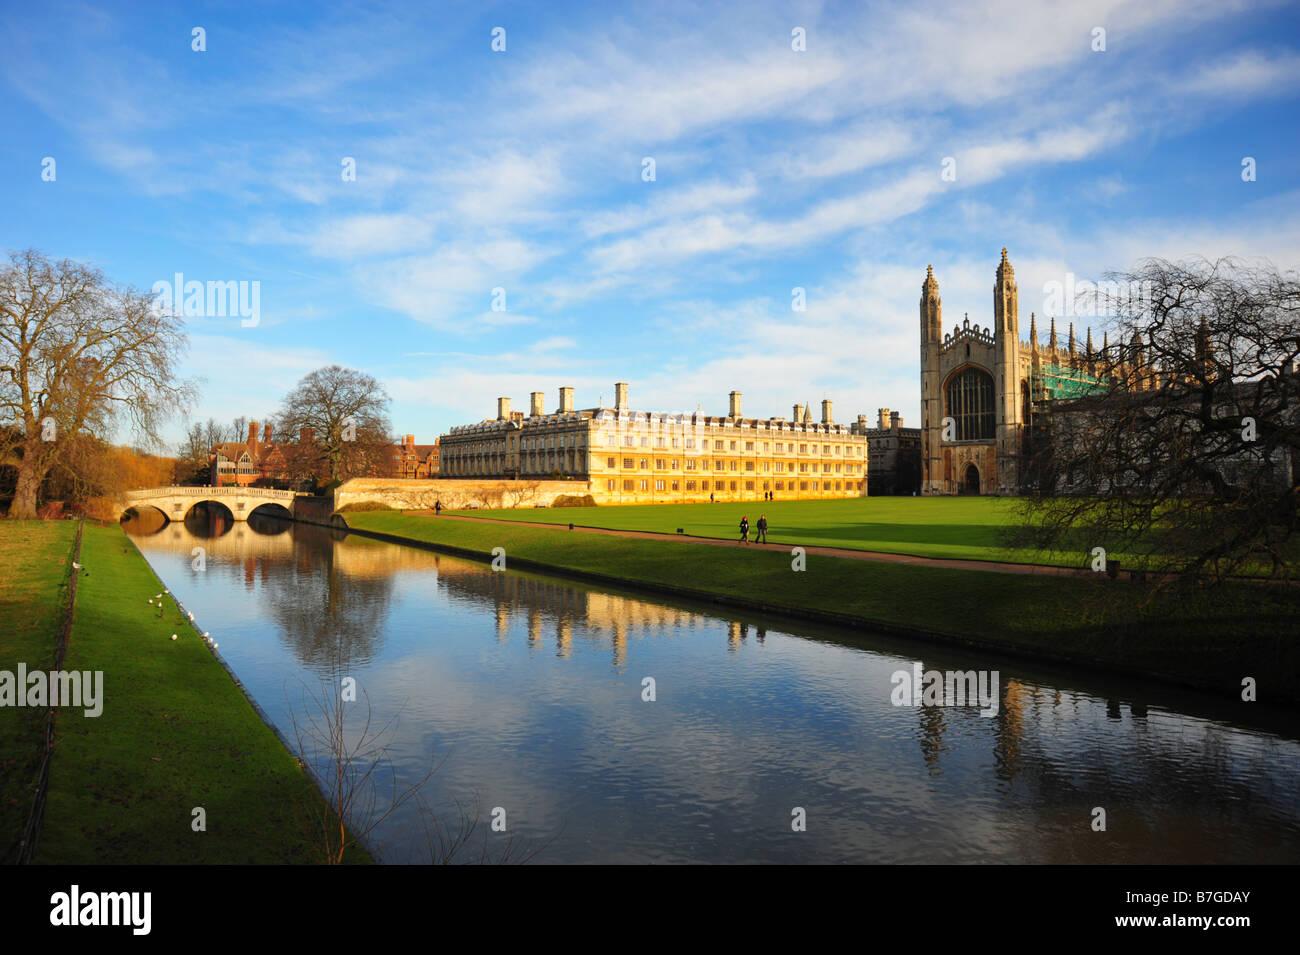 Cambridge University buildings - Stock Image